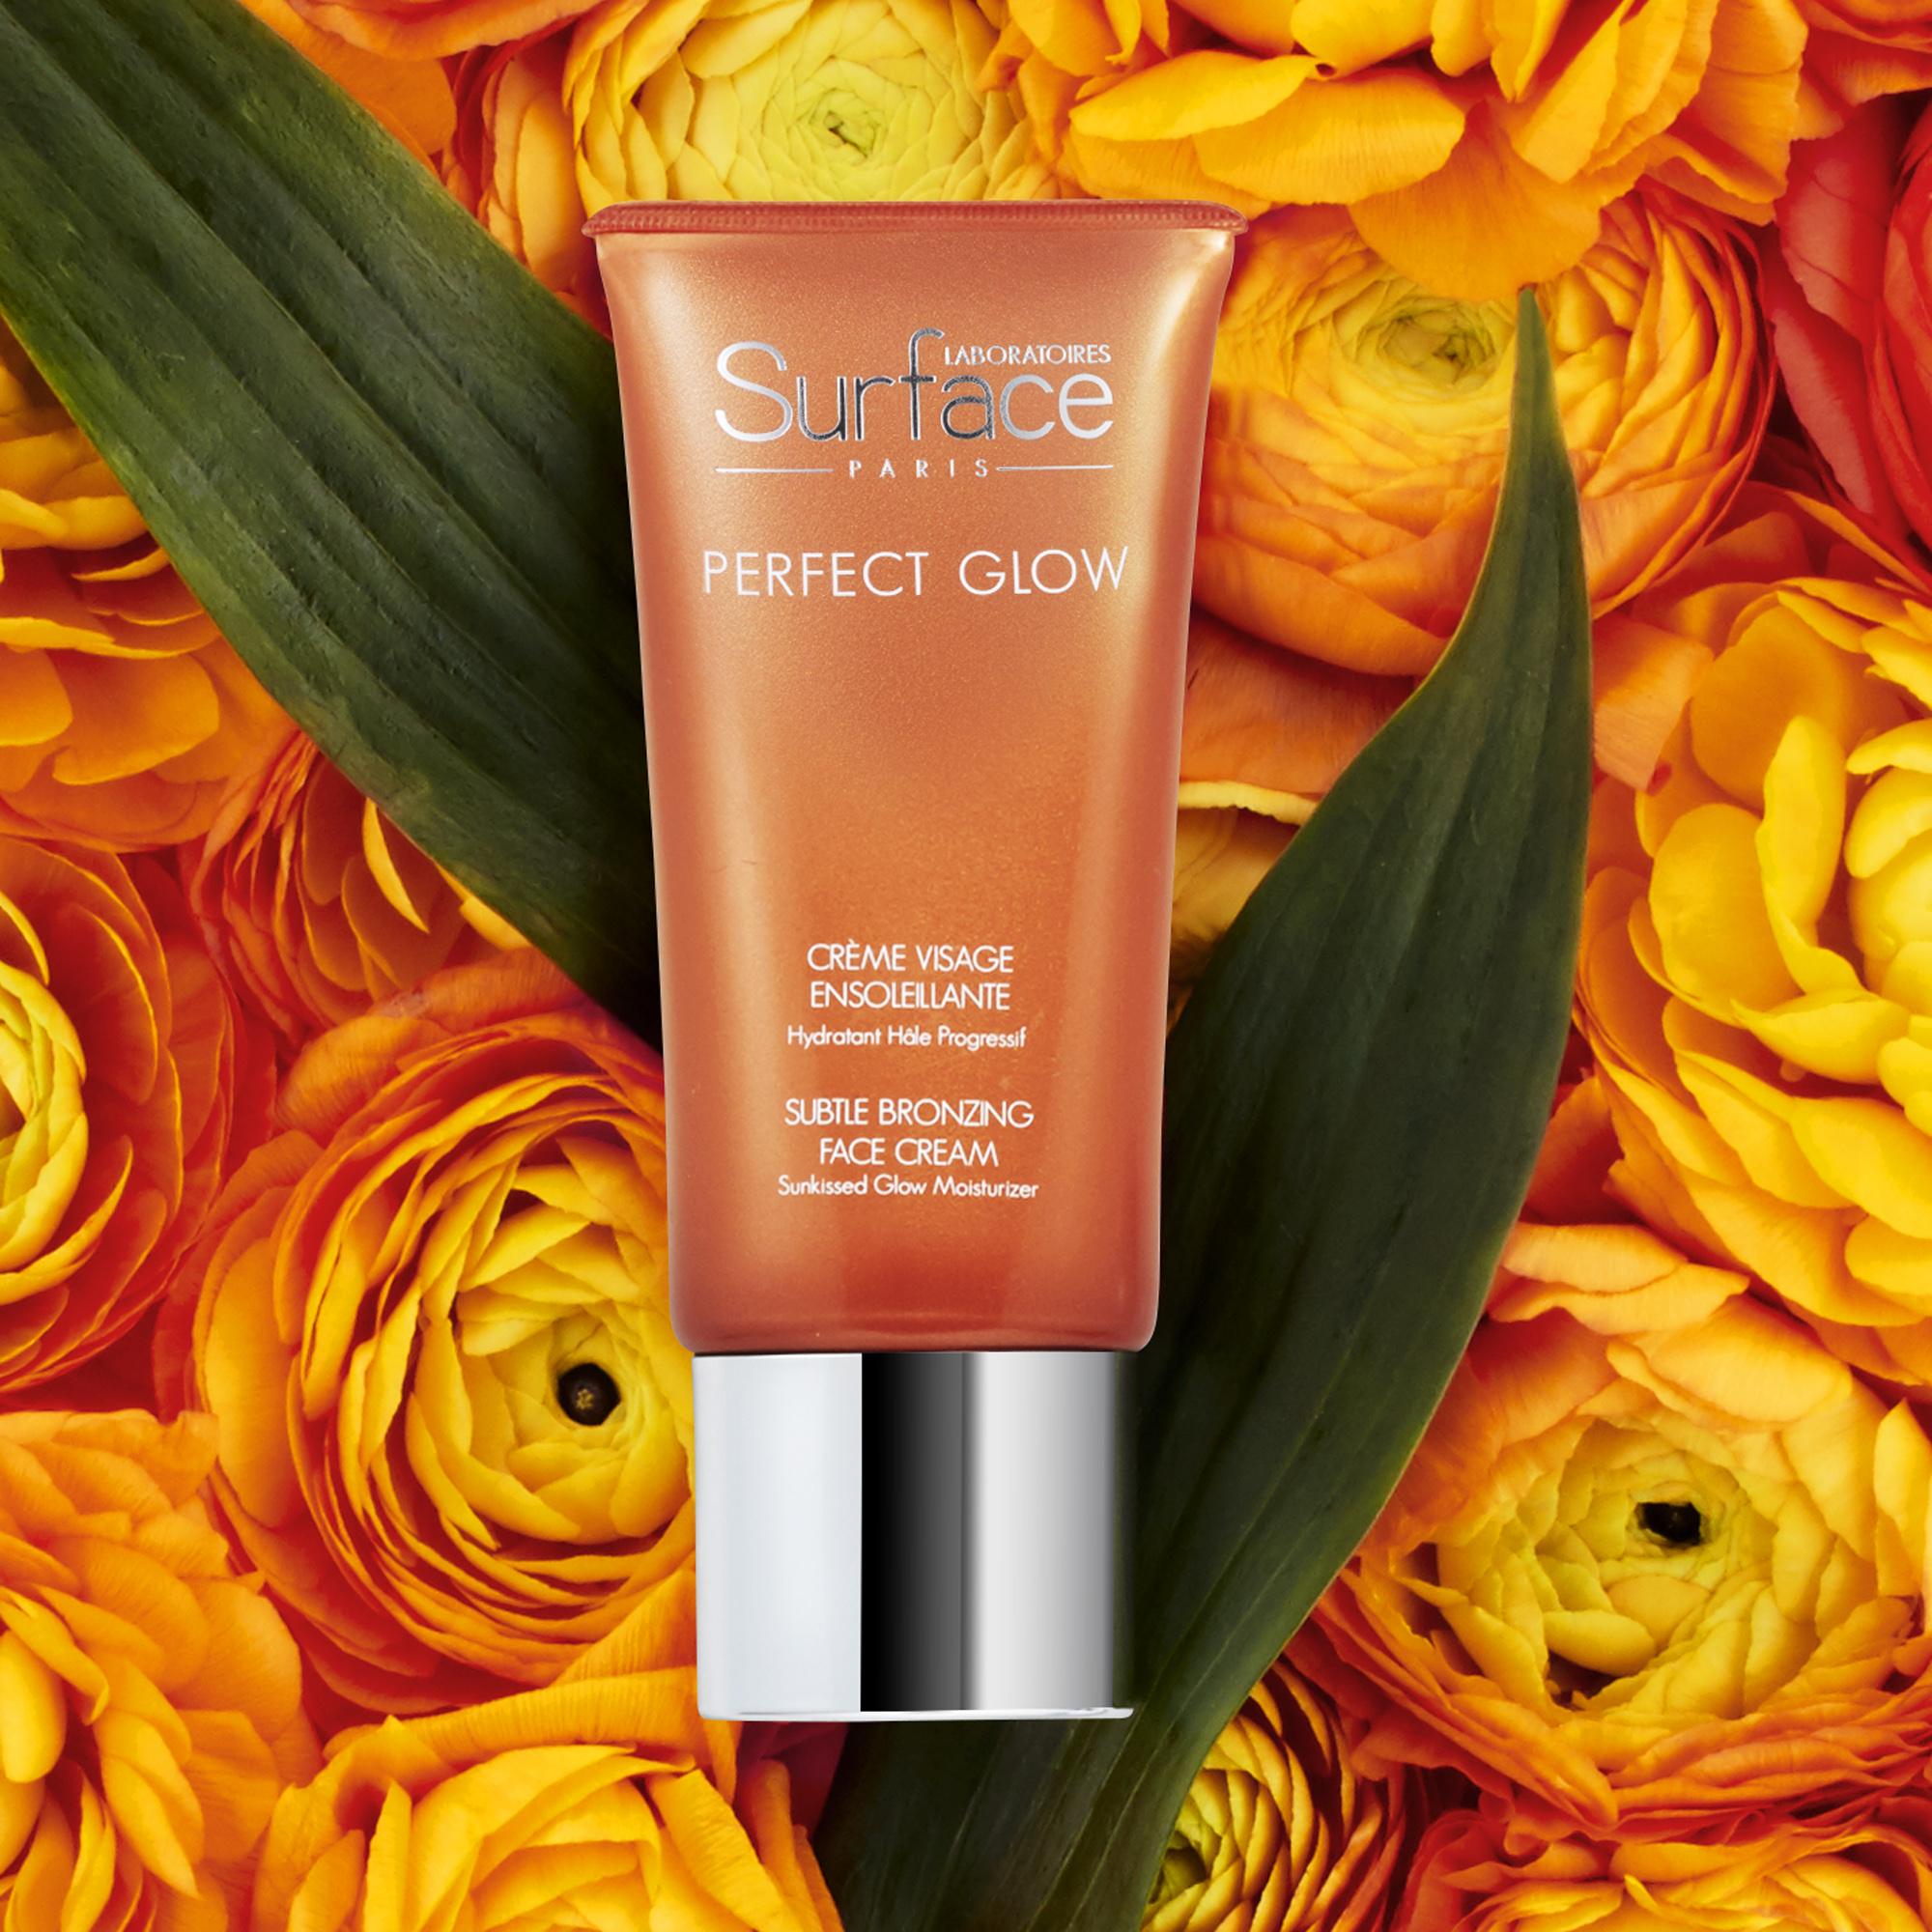 Surface Paris Subtle Bronzing Face Cream